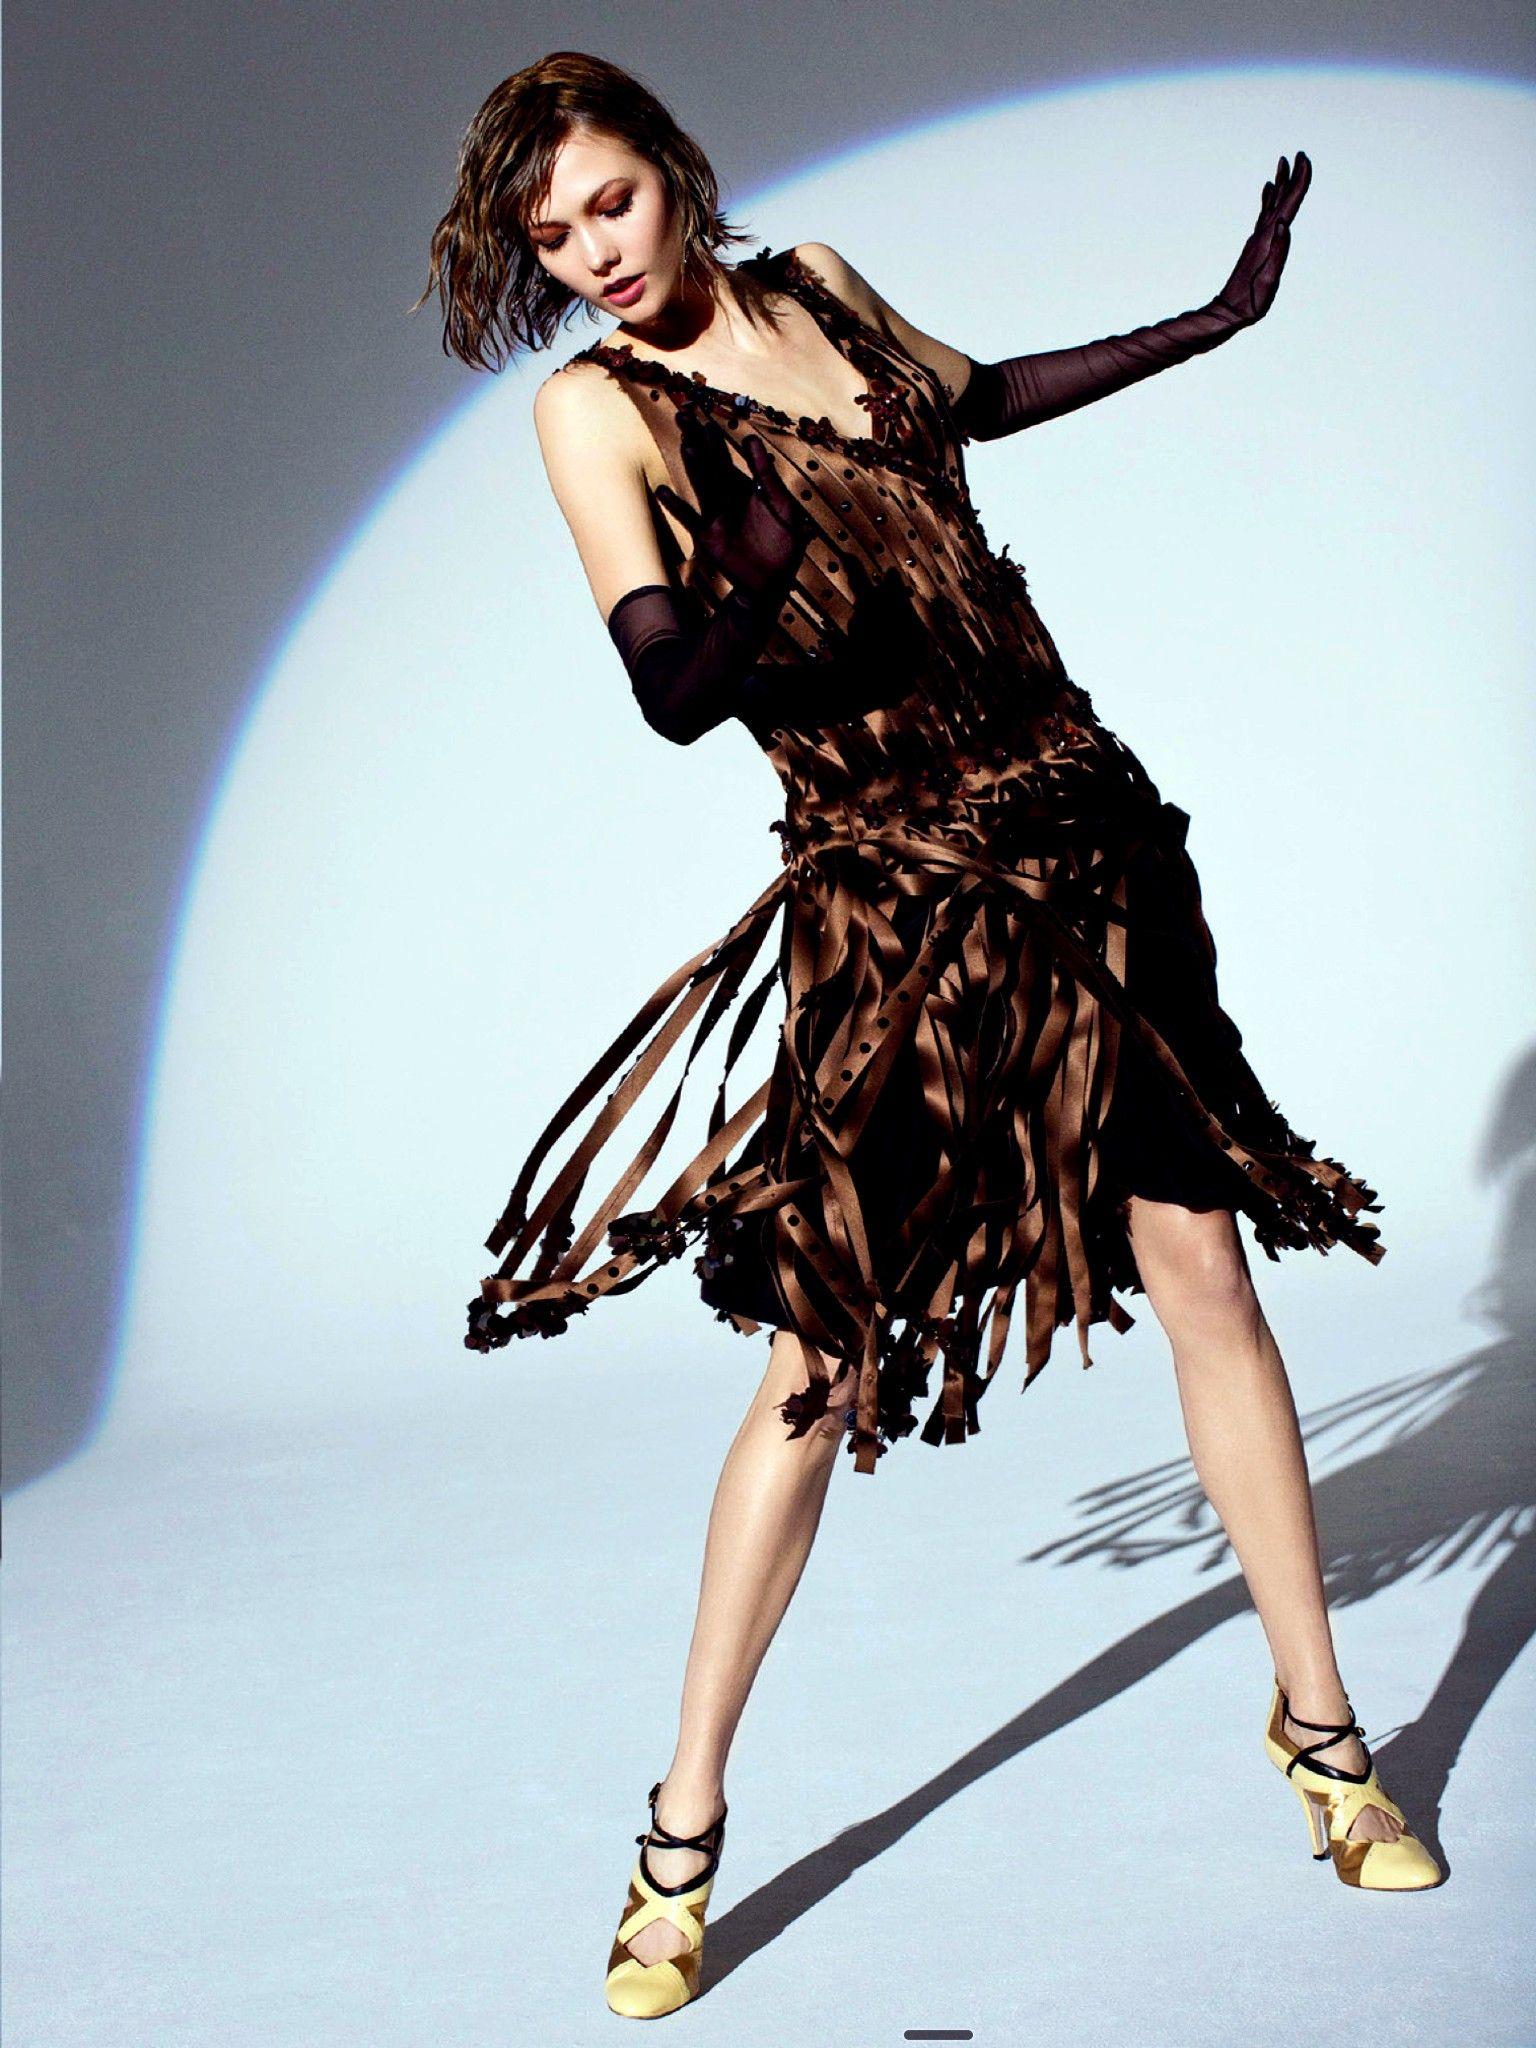 Party 1920s dress